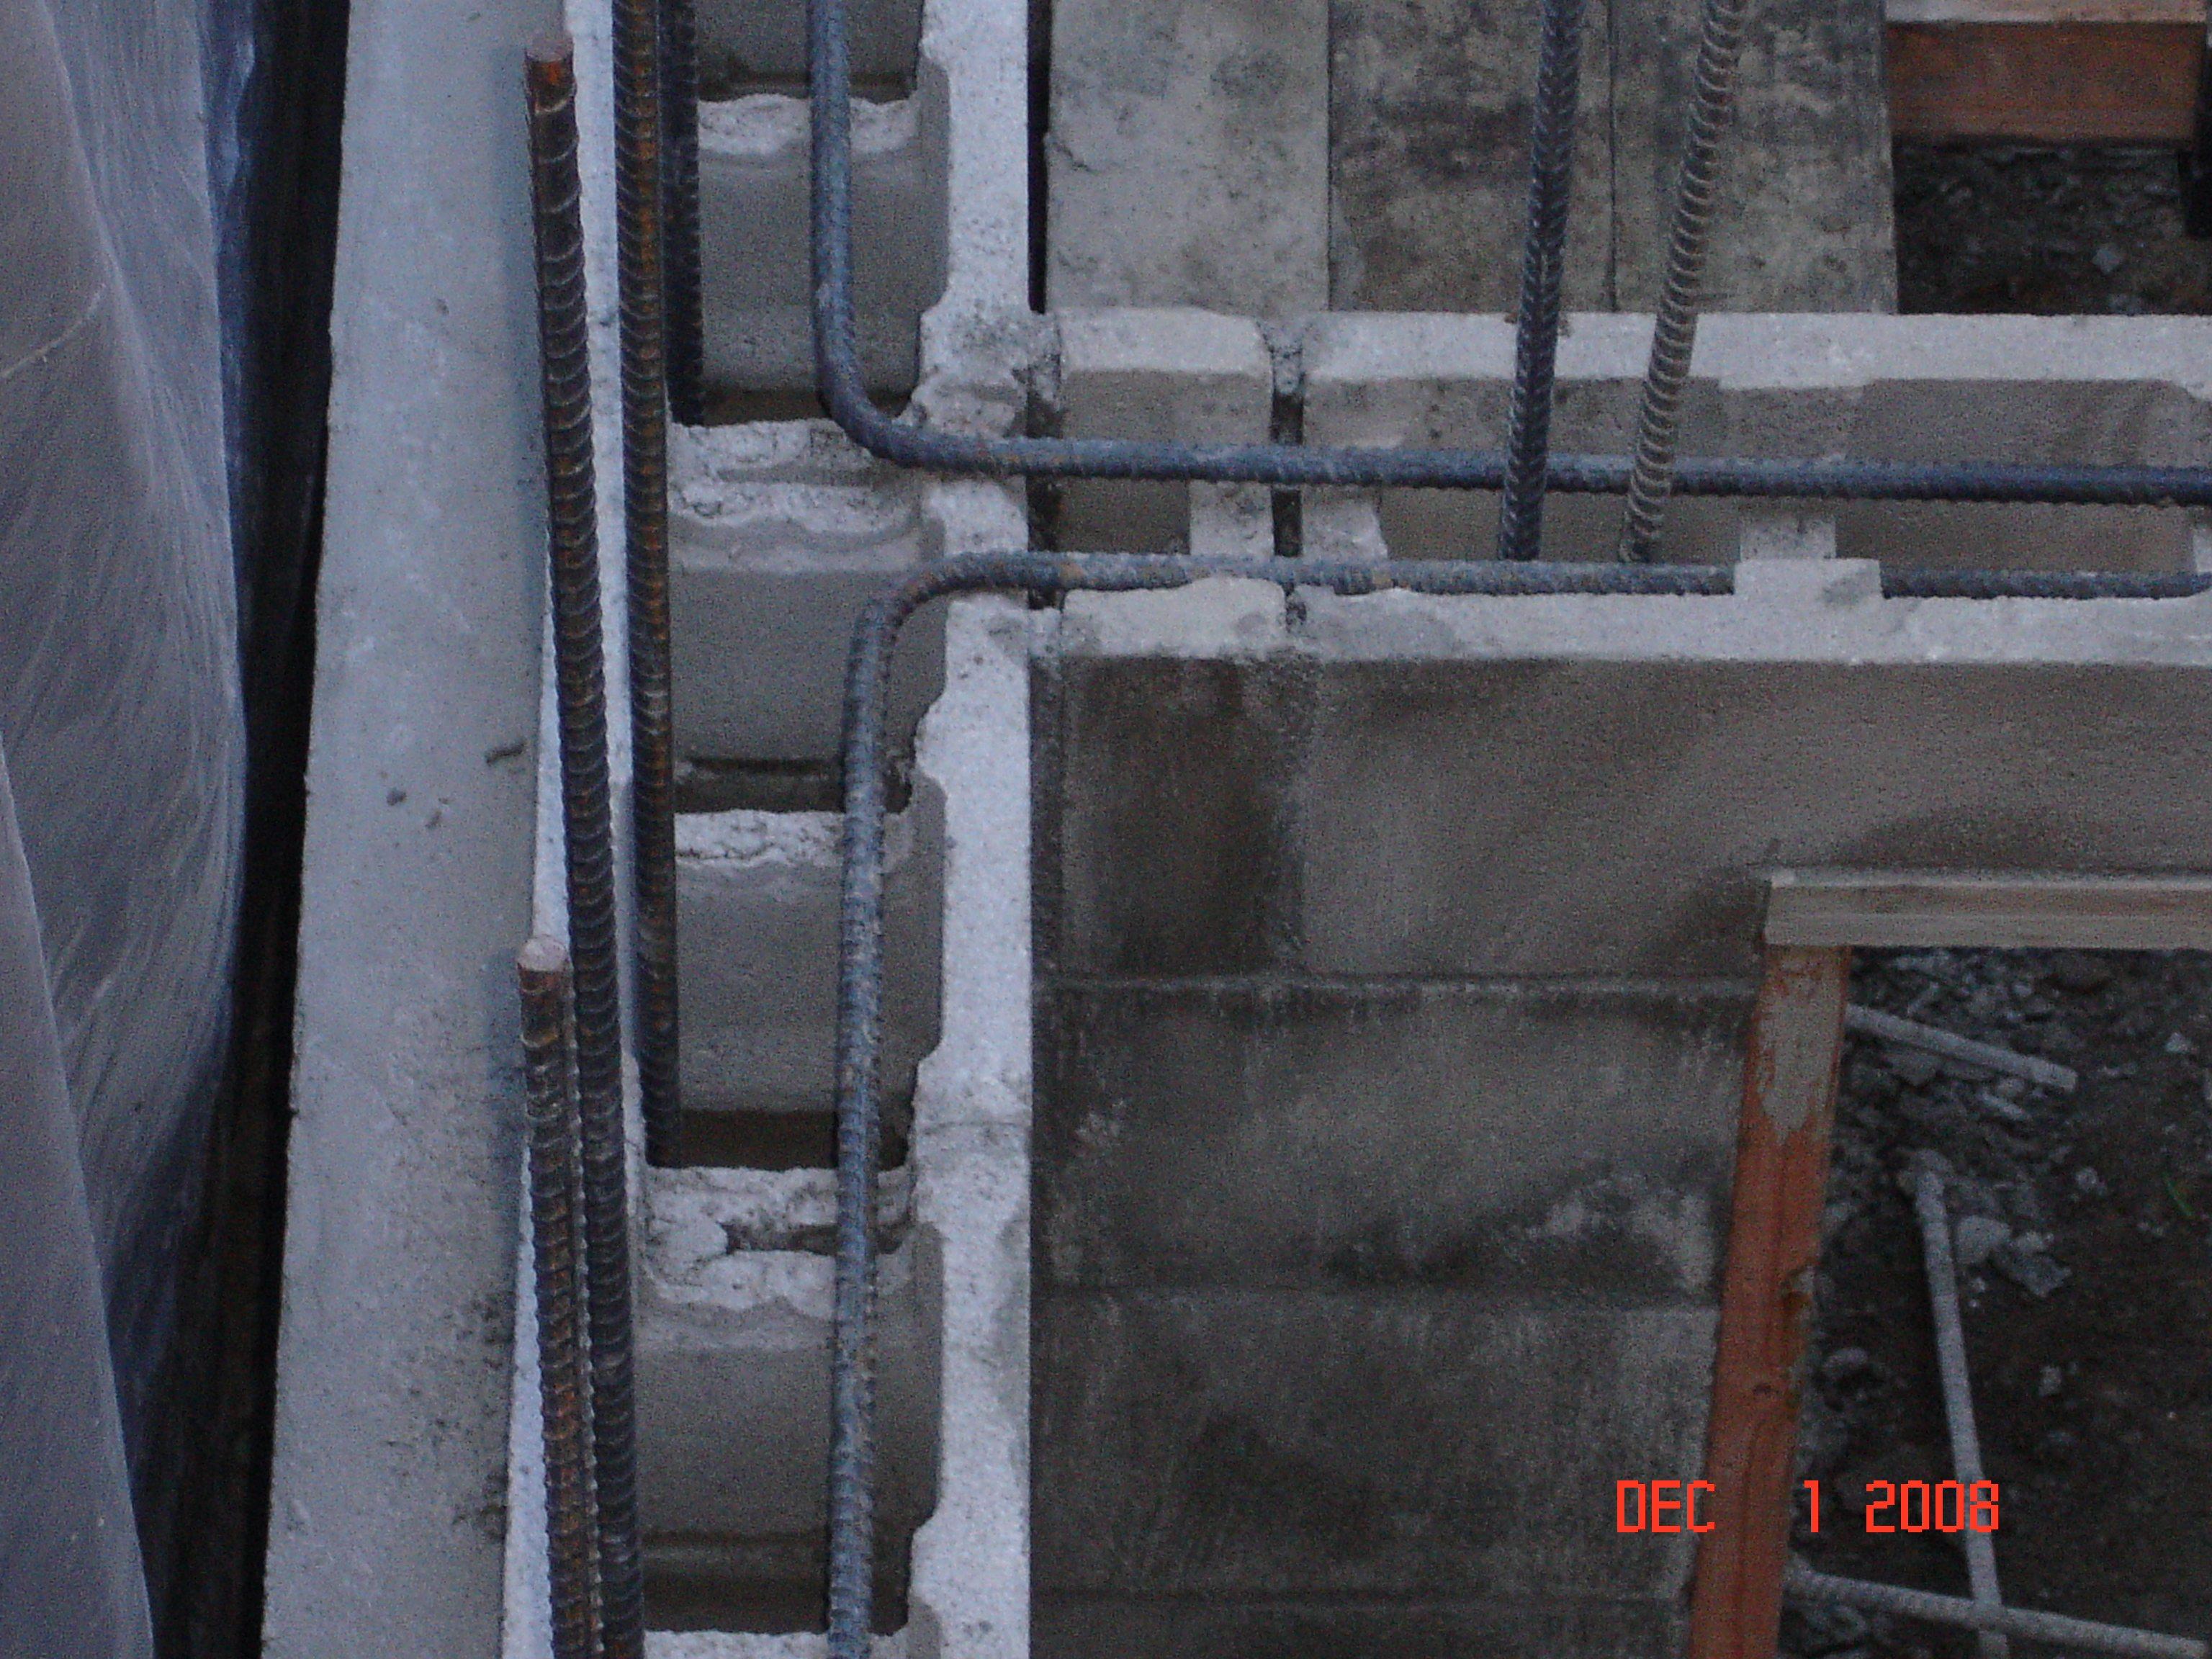 DSC03059-engineered retaining walls